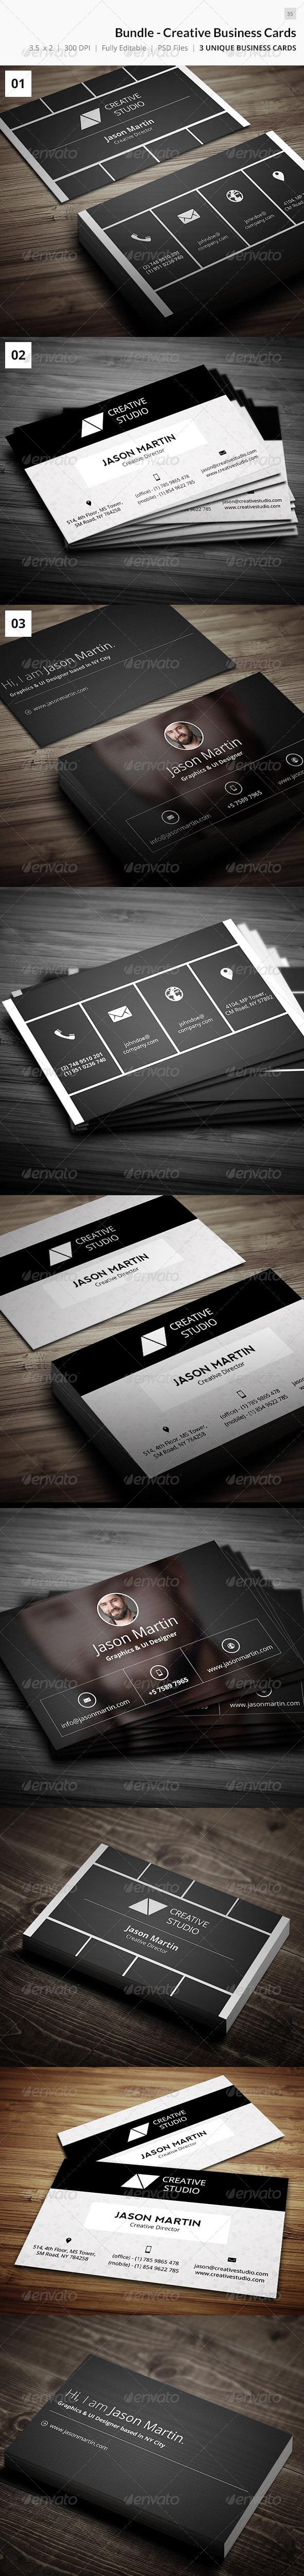 GraphicRiver Bundle Creative Business Cards 35 8319027